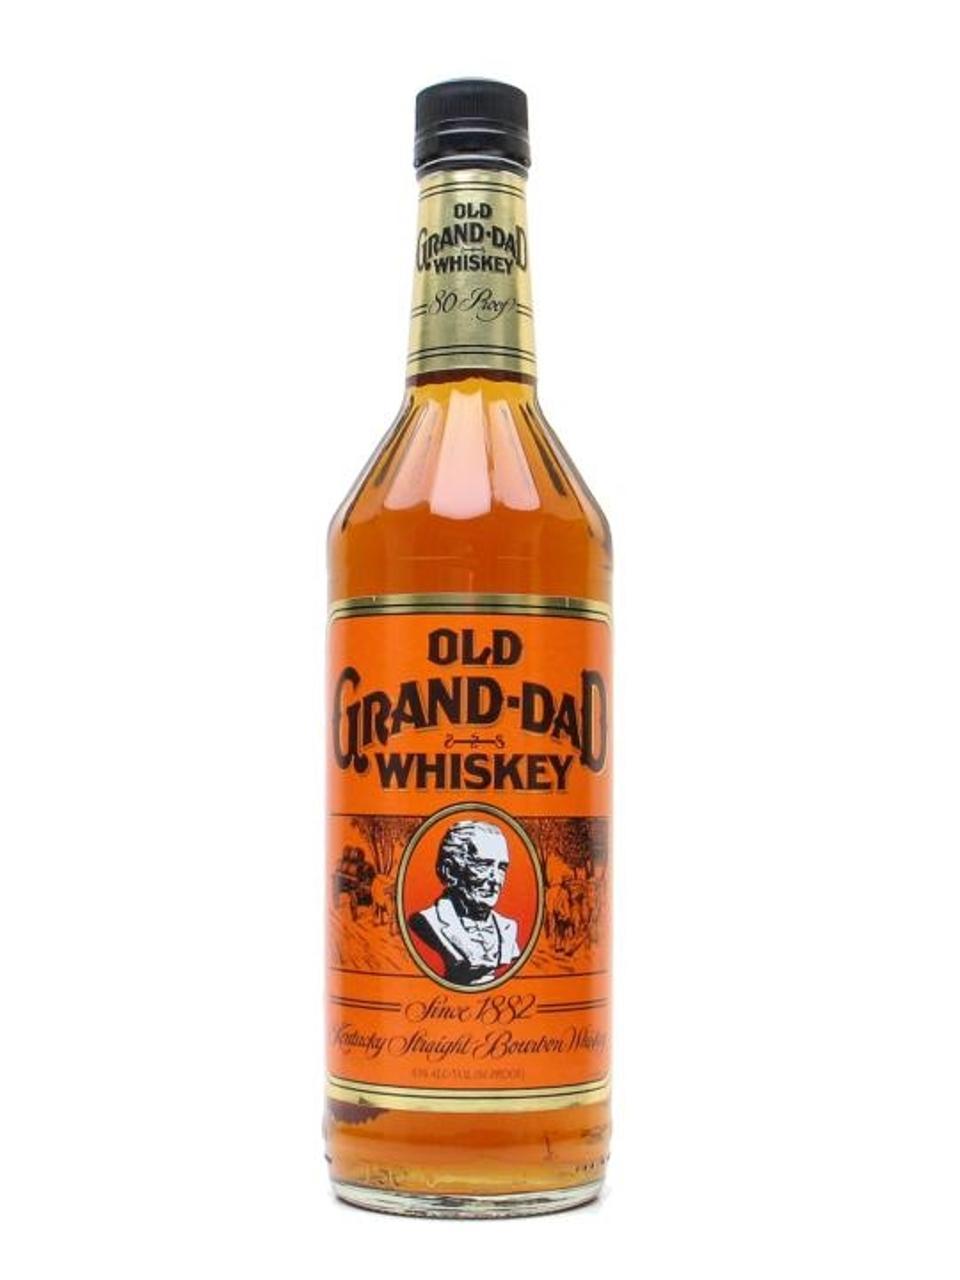 Old Grand-Dad Bourbon